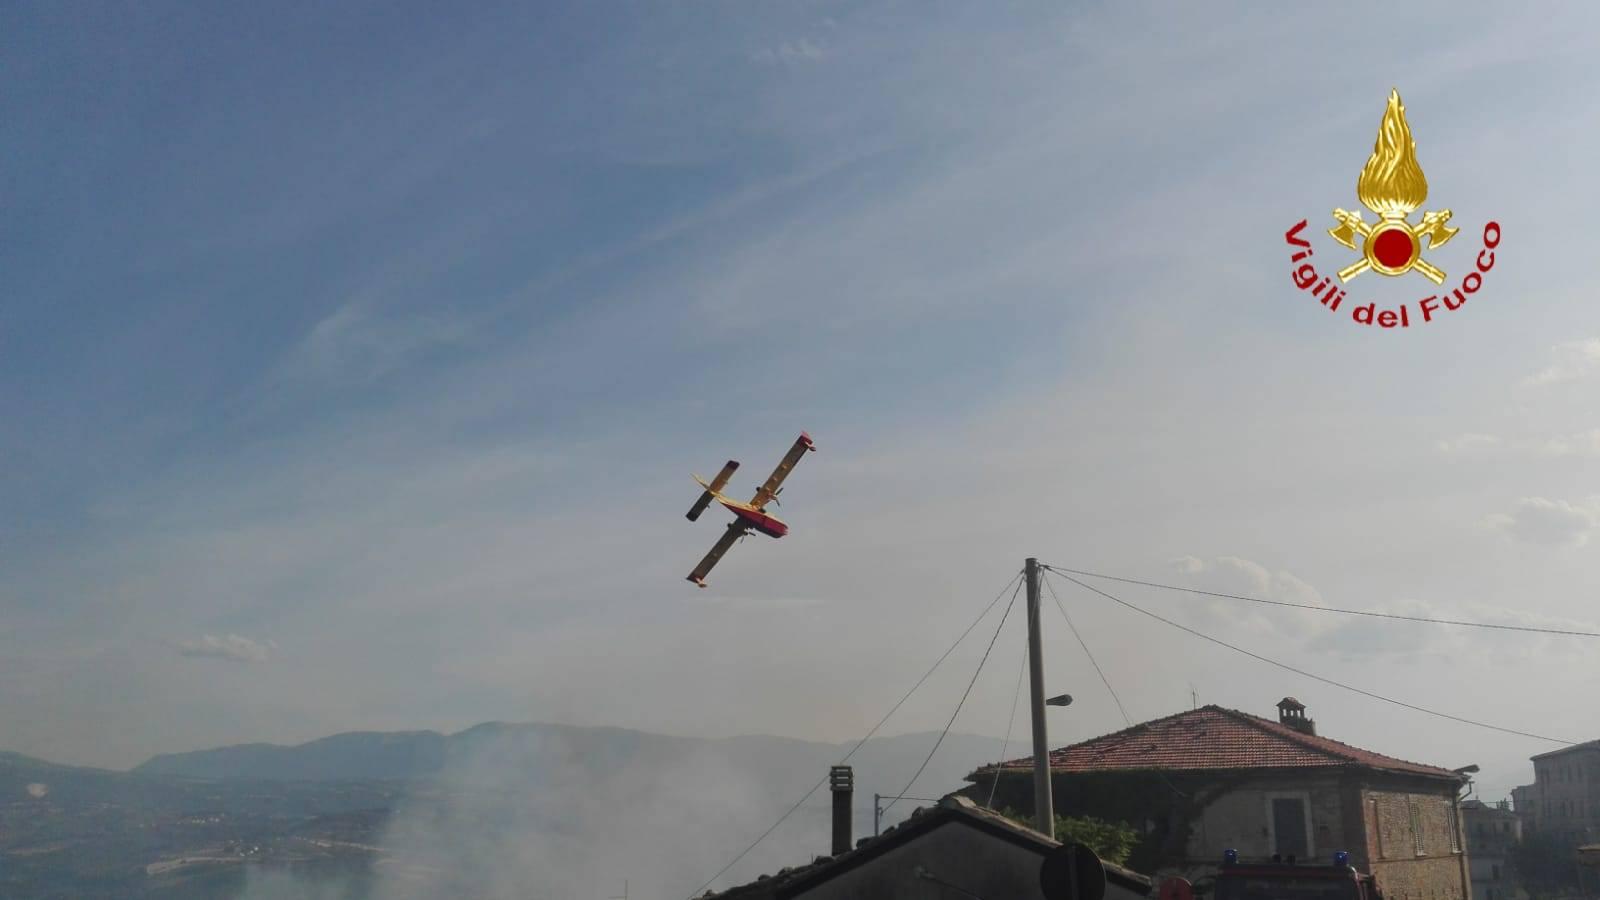 vasto-incendio-a-rosciano,-evacuate-case